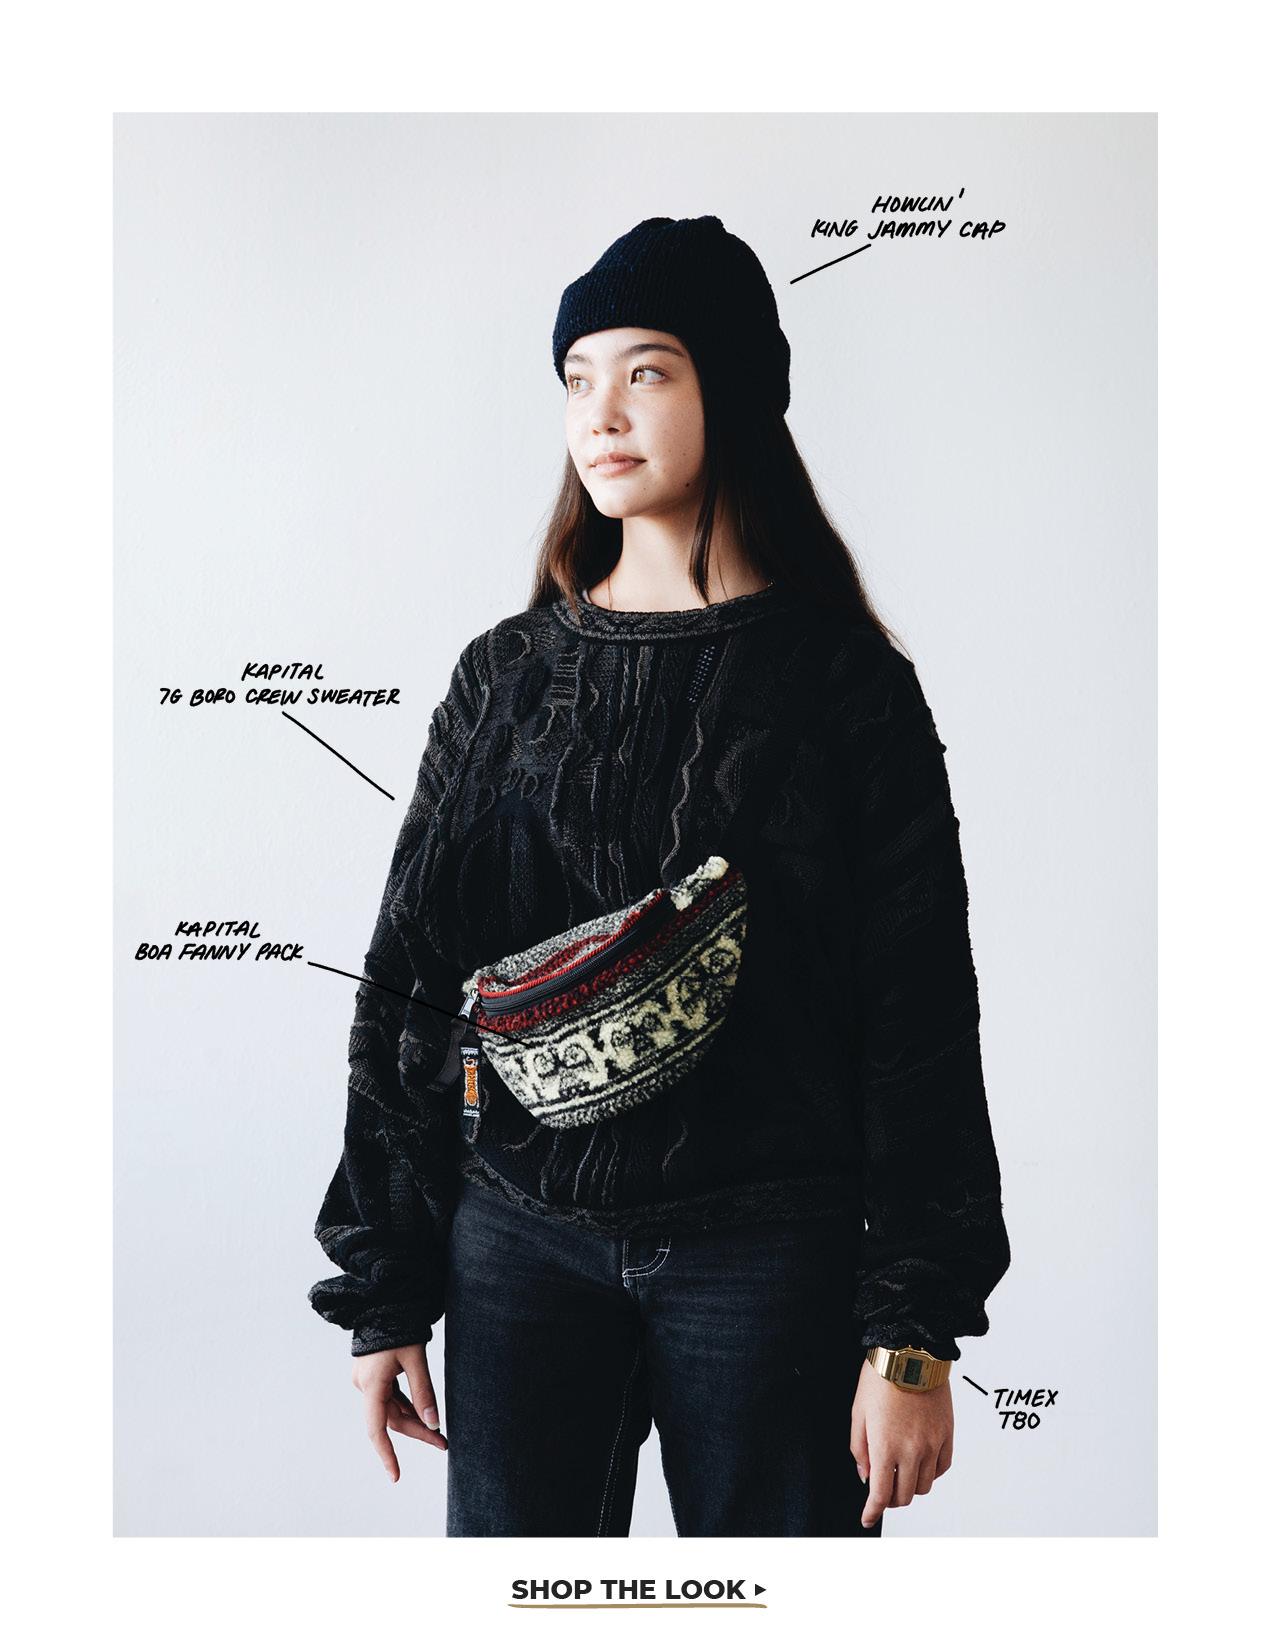 kapital birds-eye fanny pack, howlin' king jammy cap, timex t80 watch and kapital boro crew sweater on body